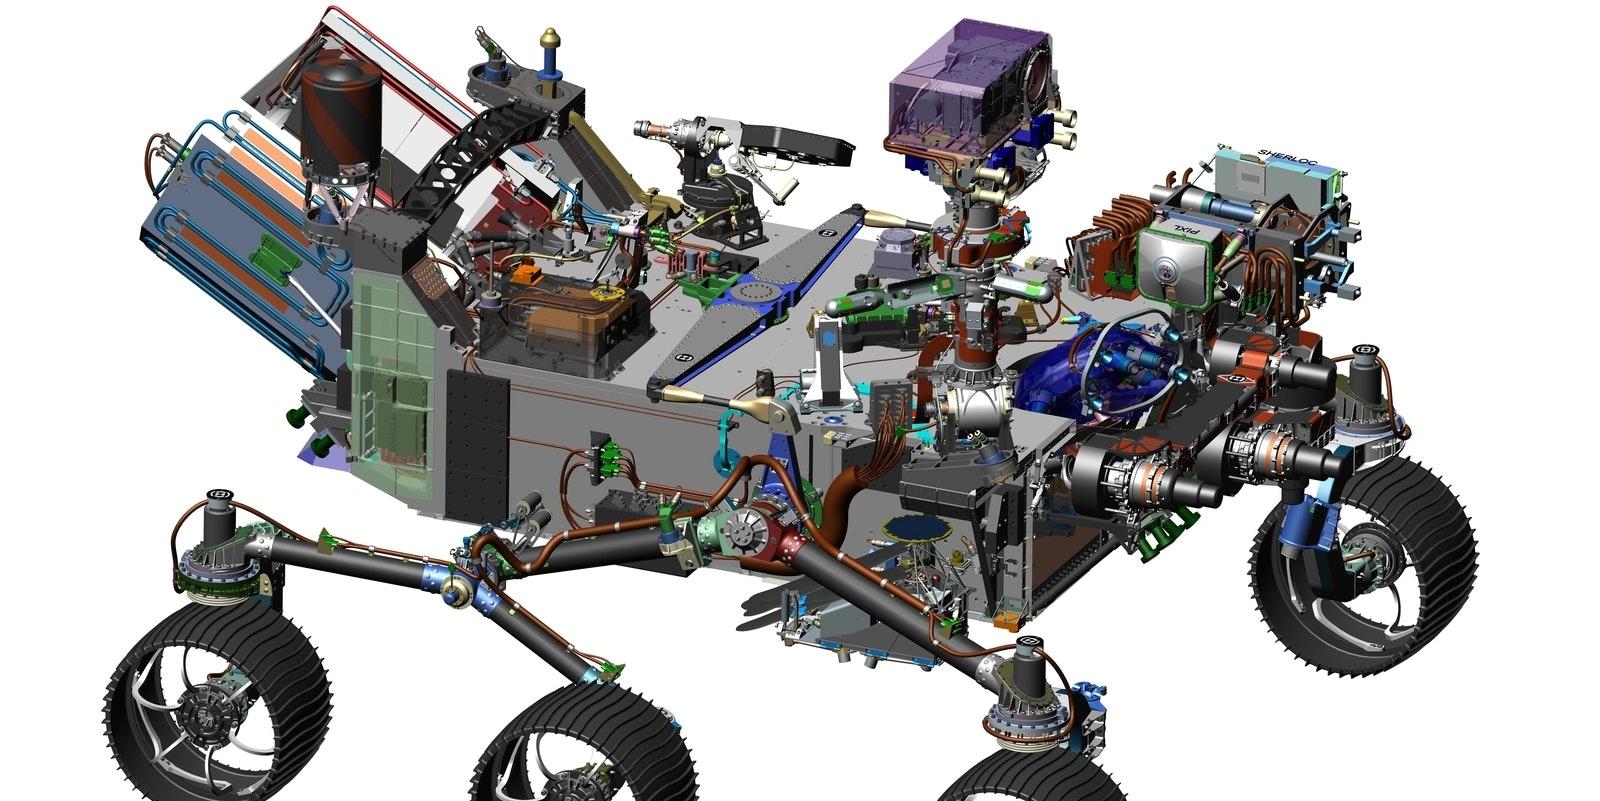 Concept design for Mars 2020 rover